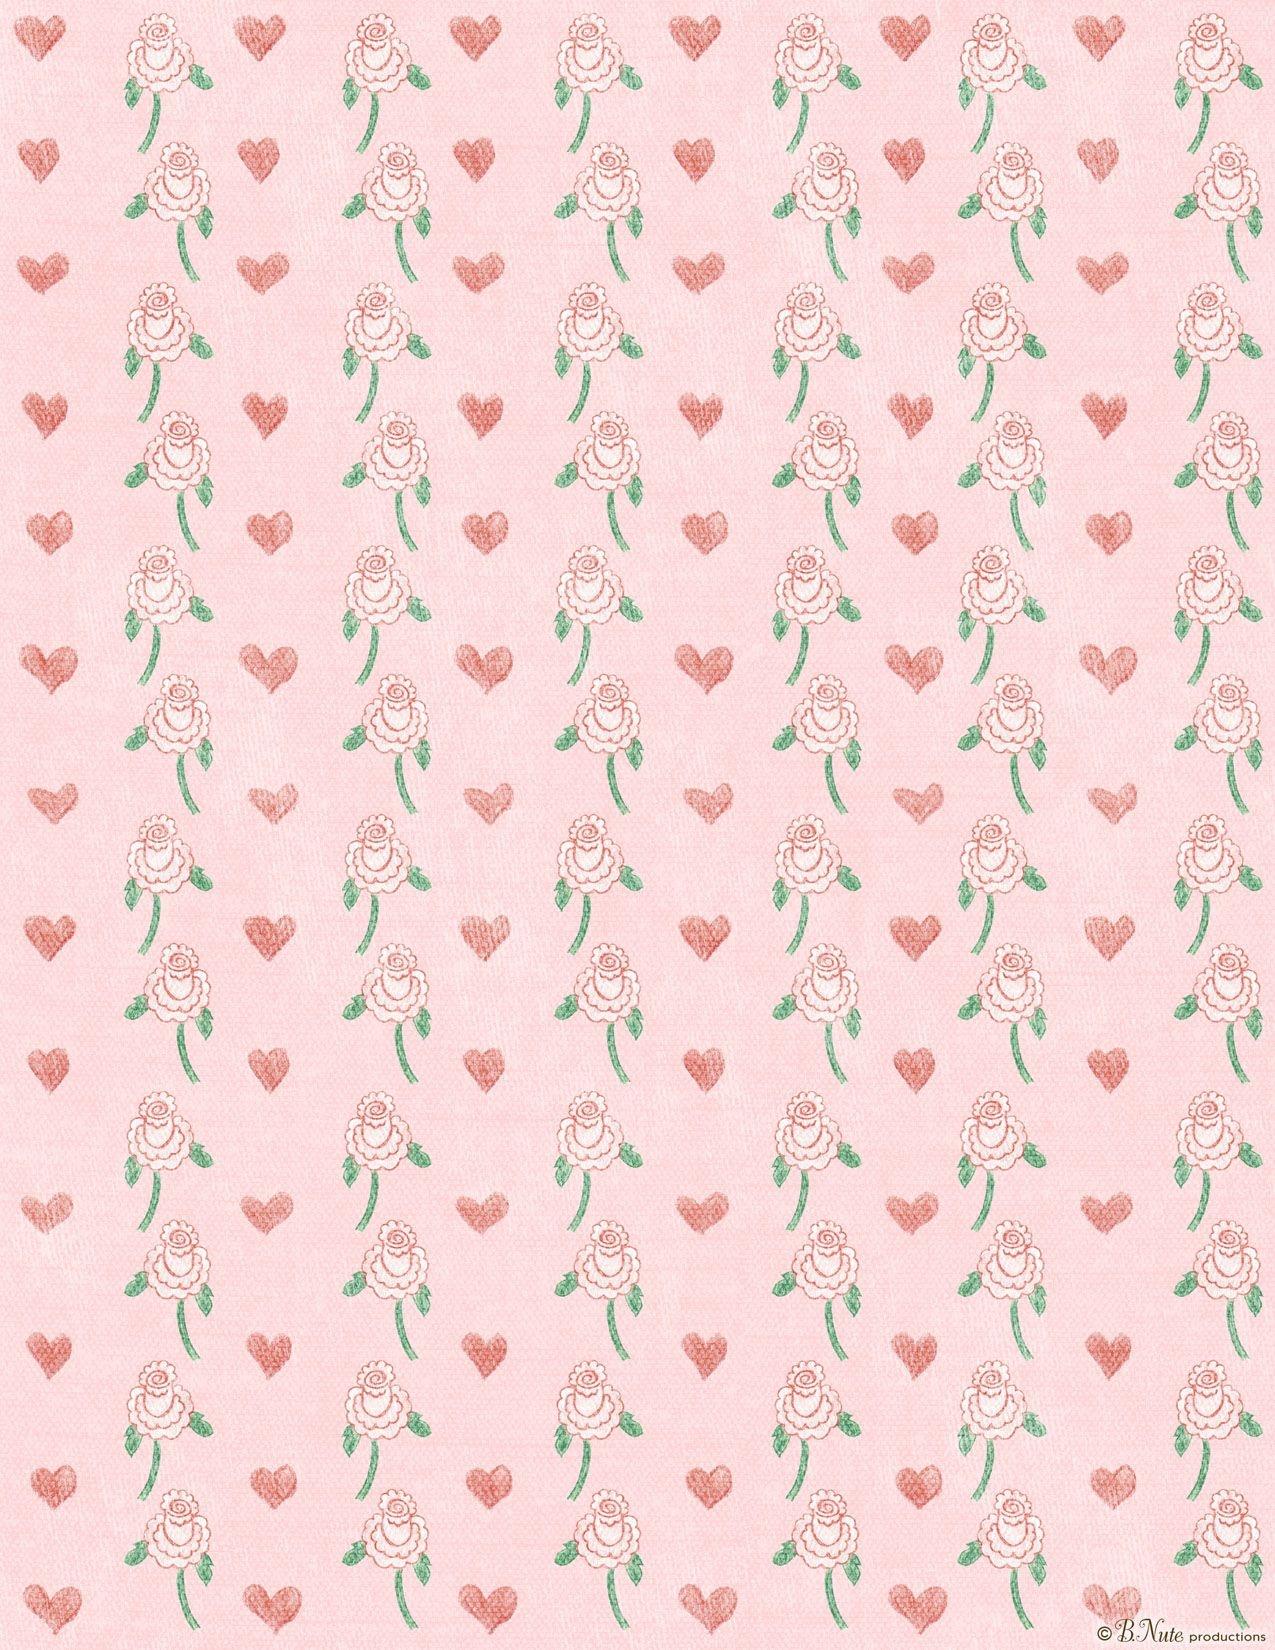 Free Paper Designs To Print   Free Printable Hearts 'n Flowers - Free Printable Scrapbook Paper Designs